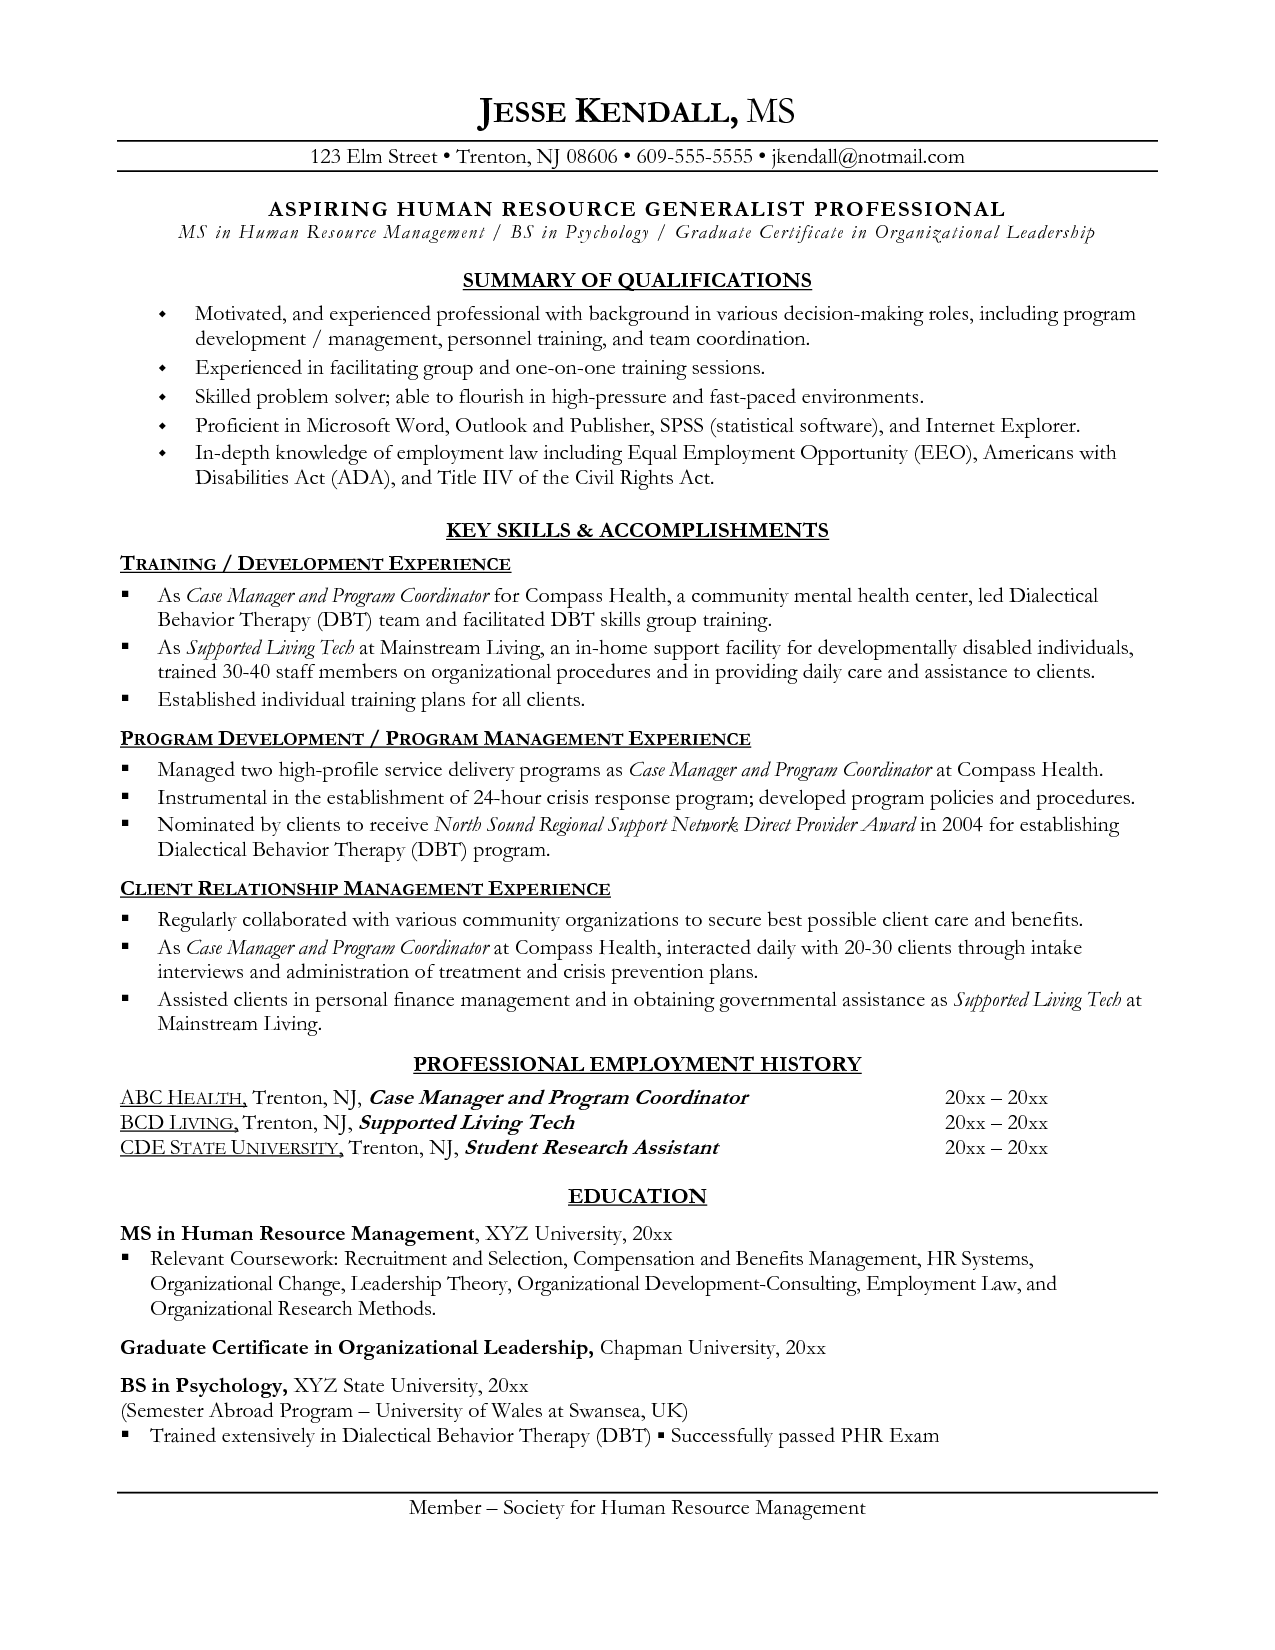 Career Change Resume Examples Samples, Career Change